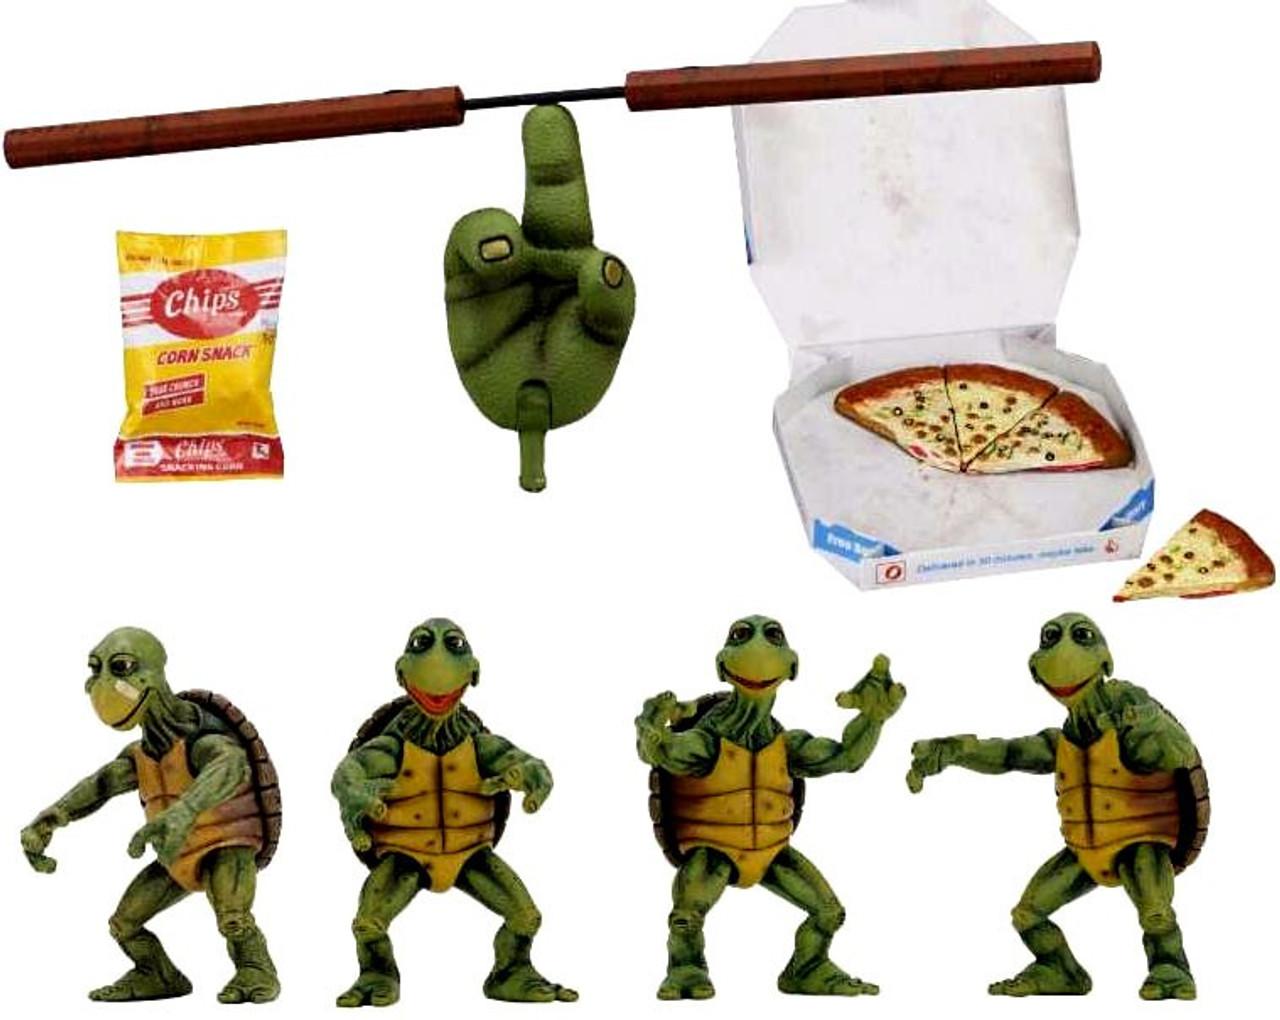 NECA Teenage Mutant Ninja Turtles Quarter Scale Baby Turtles 14 Action Figure 4-Pack Accessory